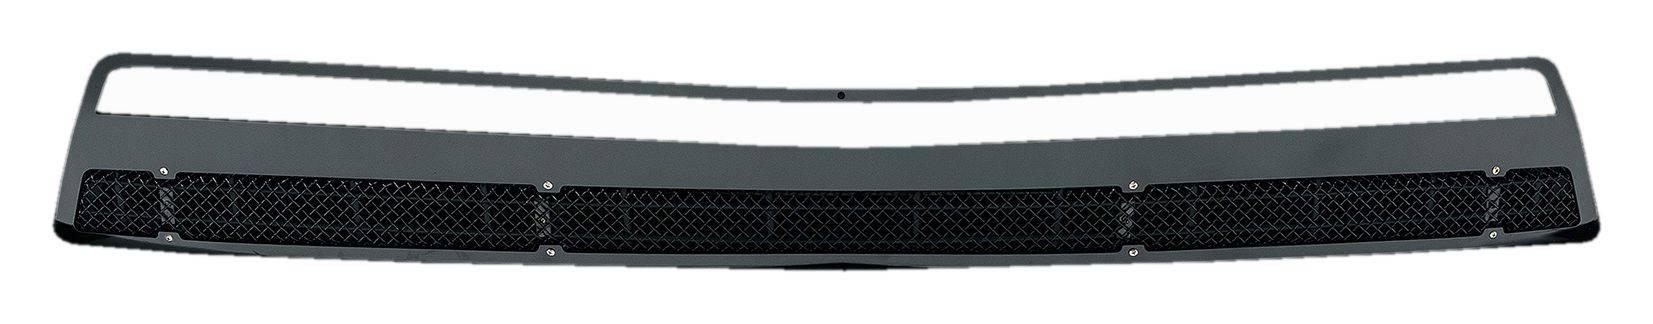 T-REX Chevrolet Camaro V6 Upper Class, Formed Mesh, Bumper Grille, Overlay, 1 Pc, Black Powdercoated Mild Steel - Pt # 52031